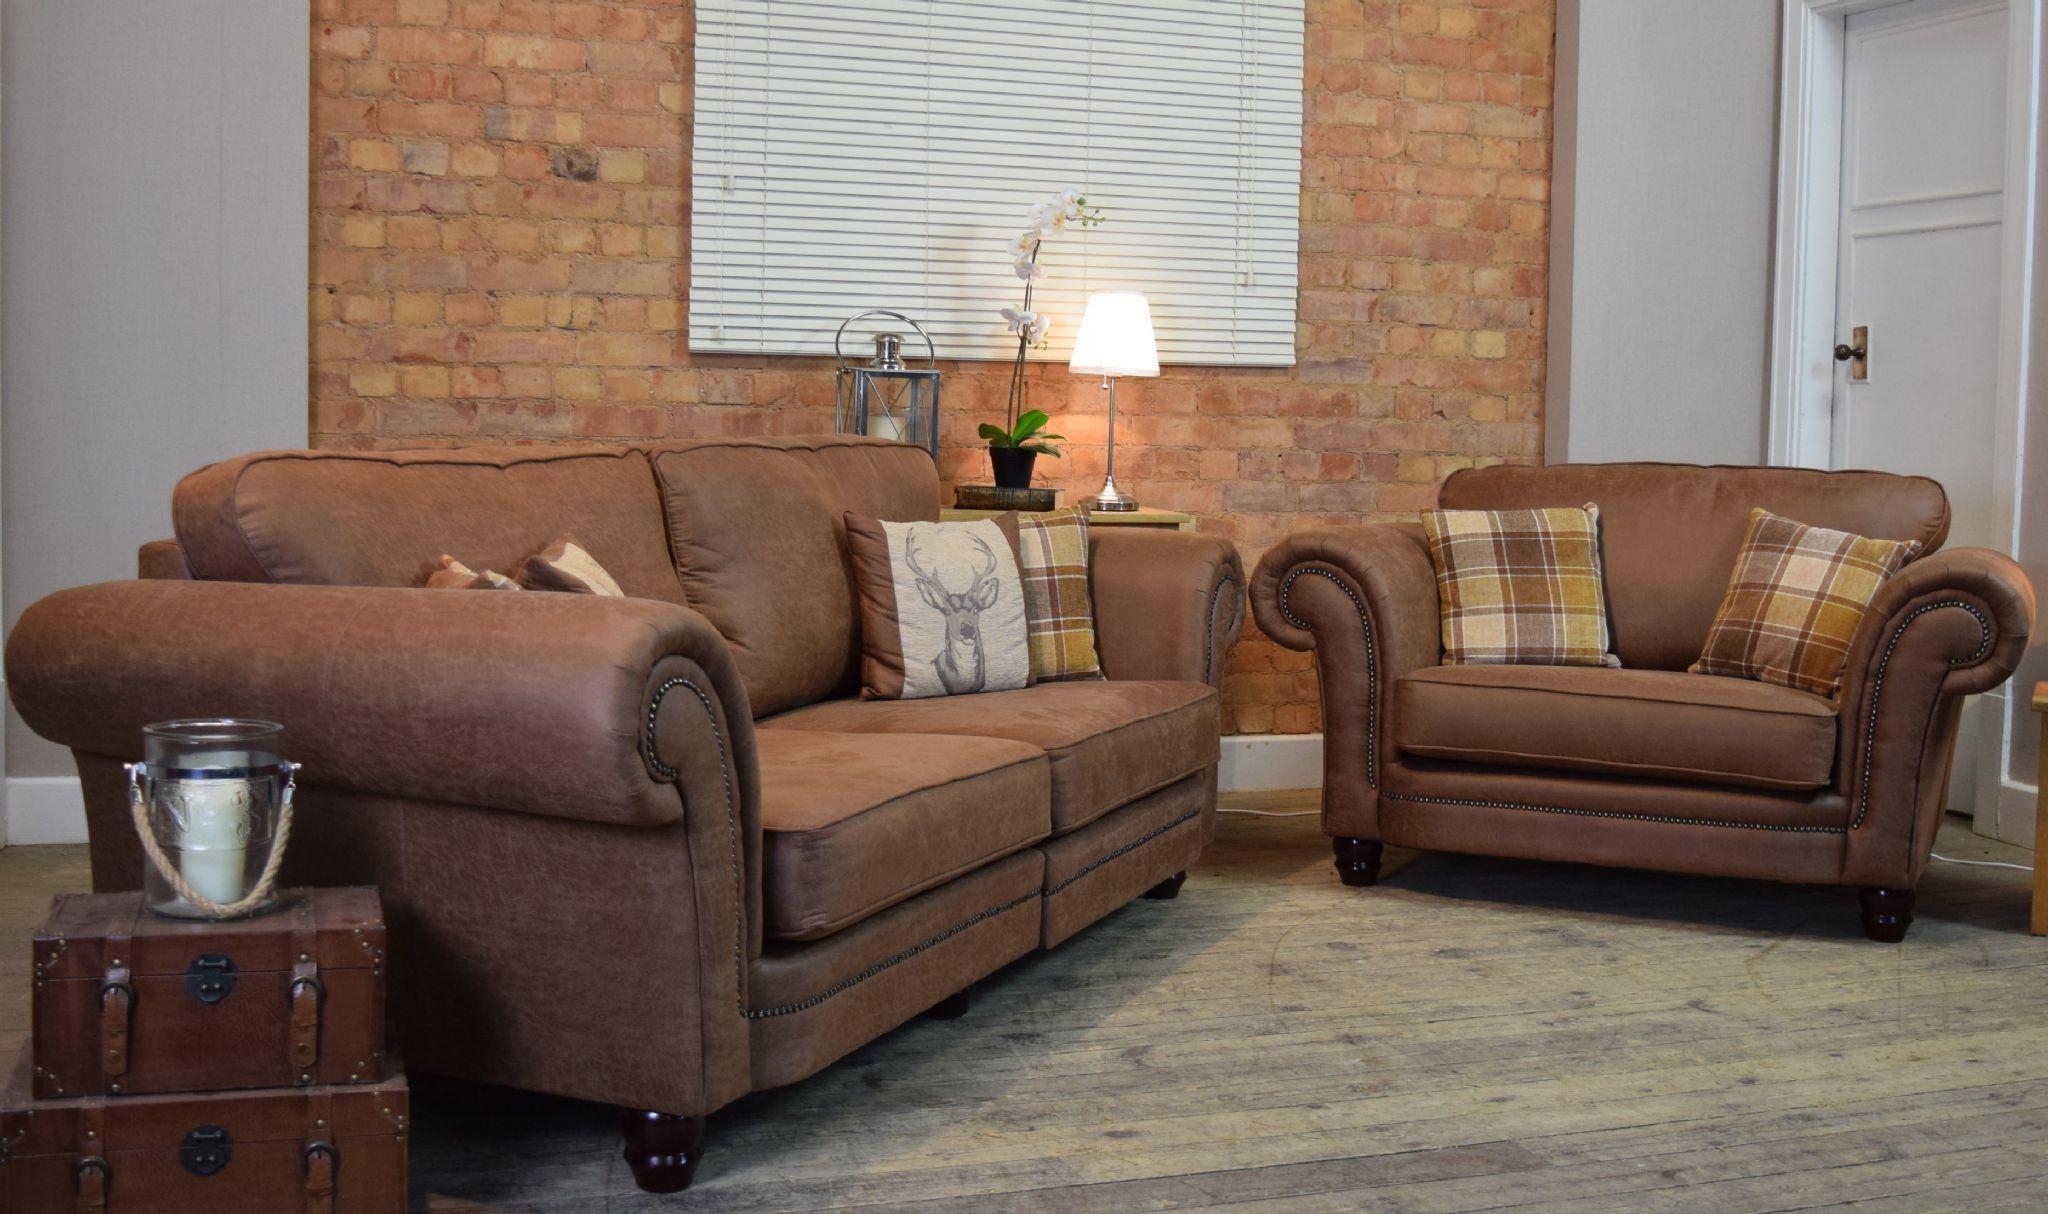 Sofa And Cuddle Chair Set   Tehranmix Decoration With 3 Seater Sofa And Cuddle Chairs (View 7 of 20)